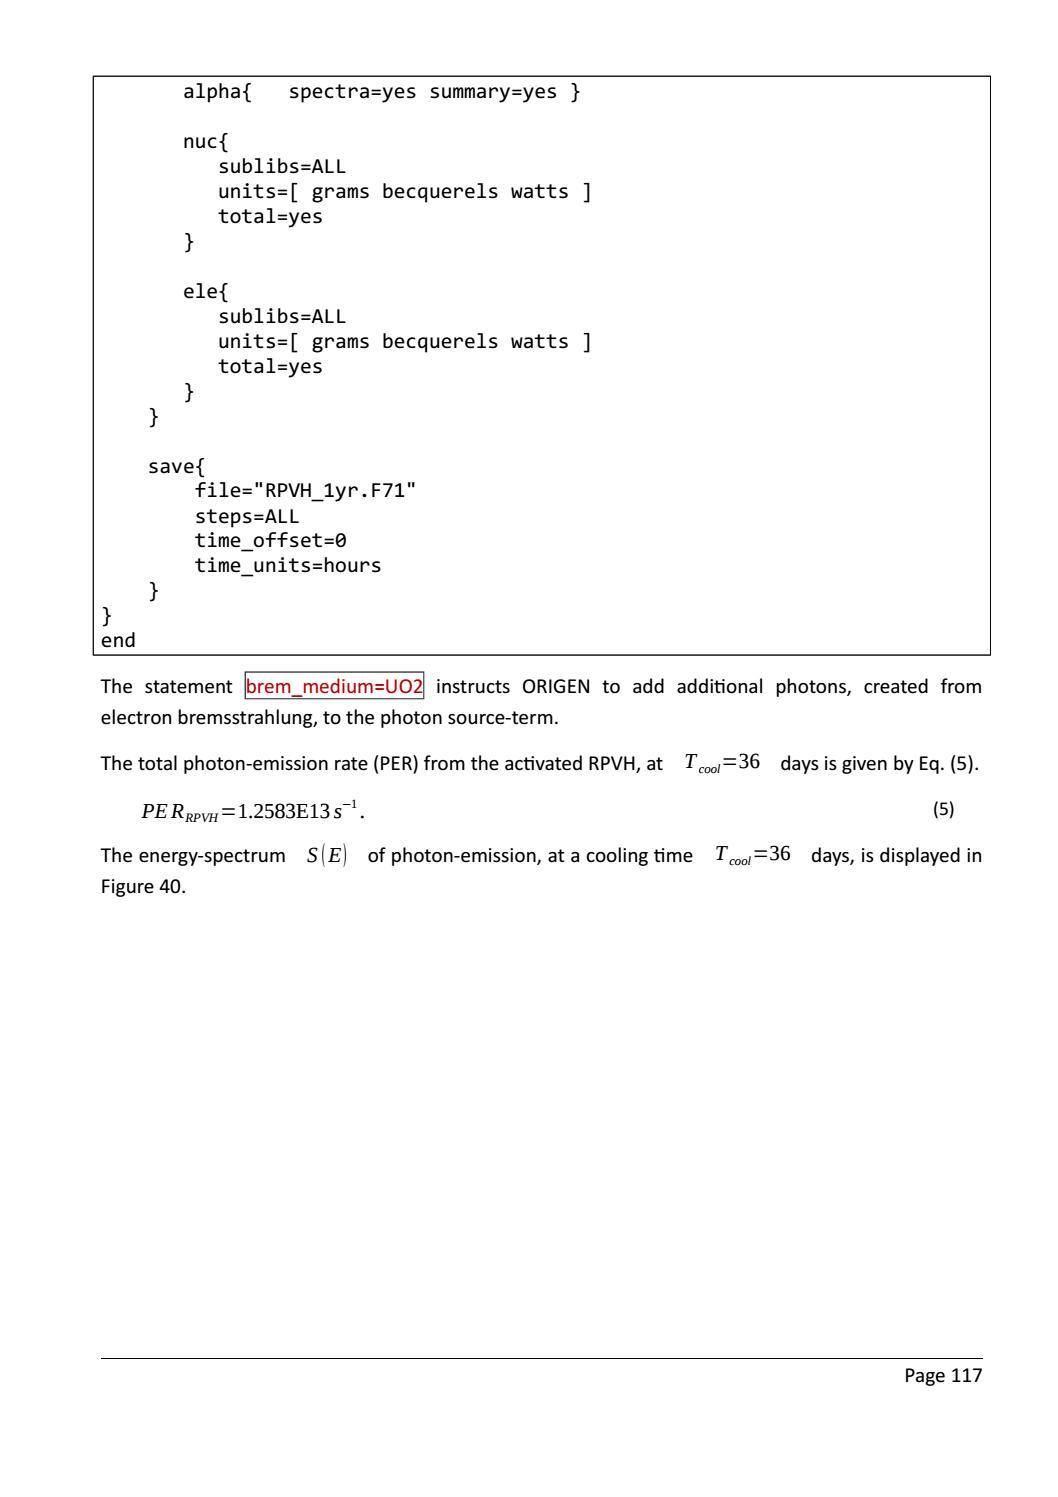 RADIOACTIVE WASTE: COMPUTATIONAL CHARACTERISATION and SHIELDING page 142